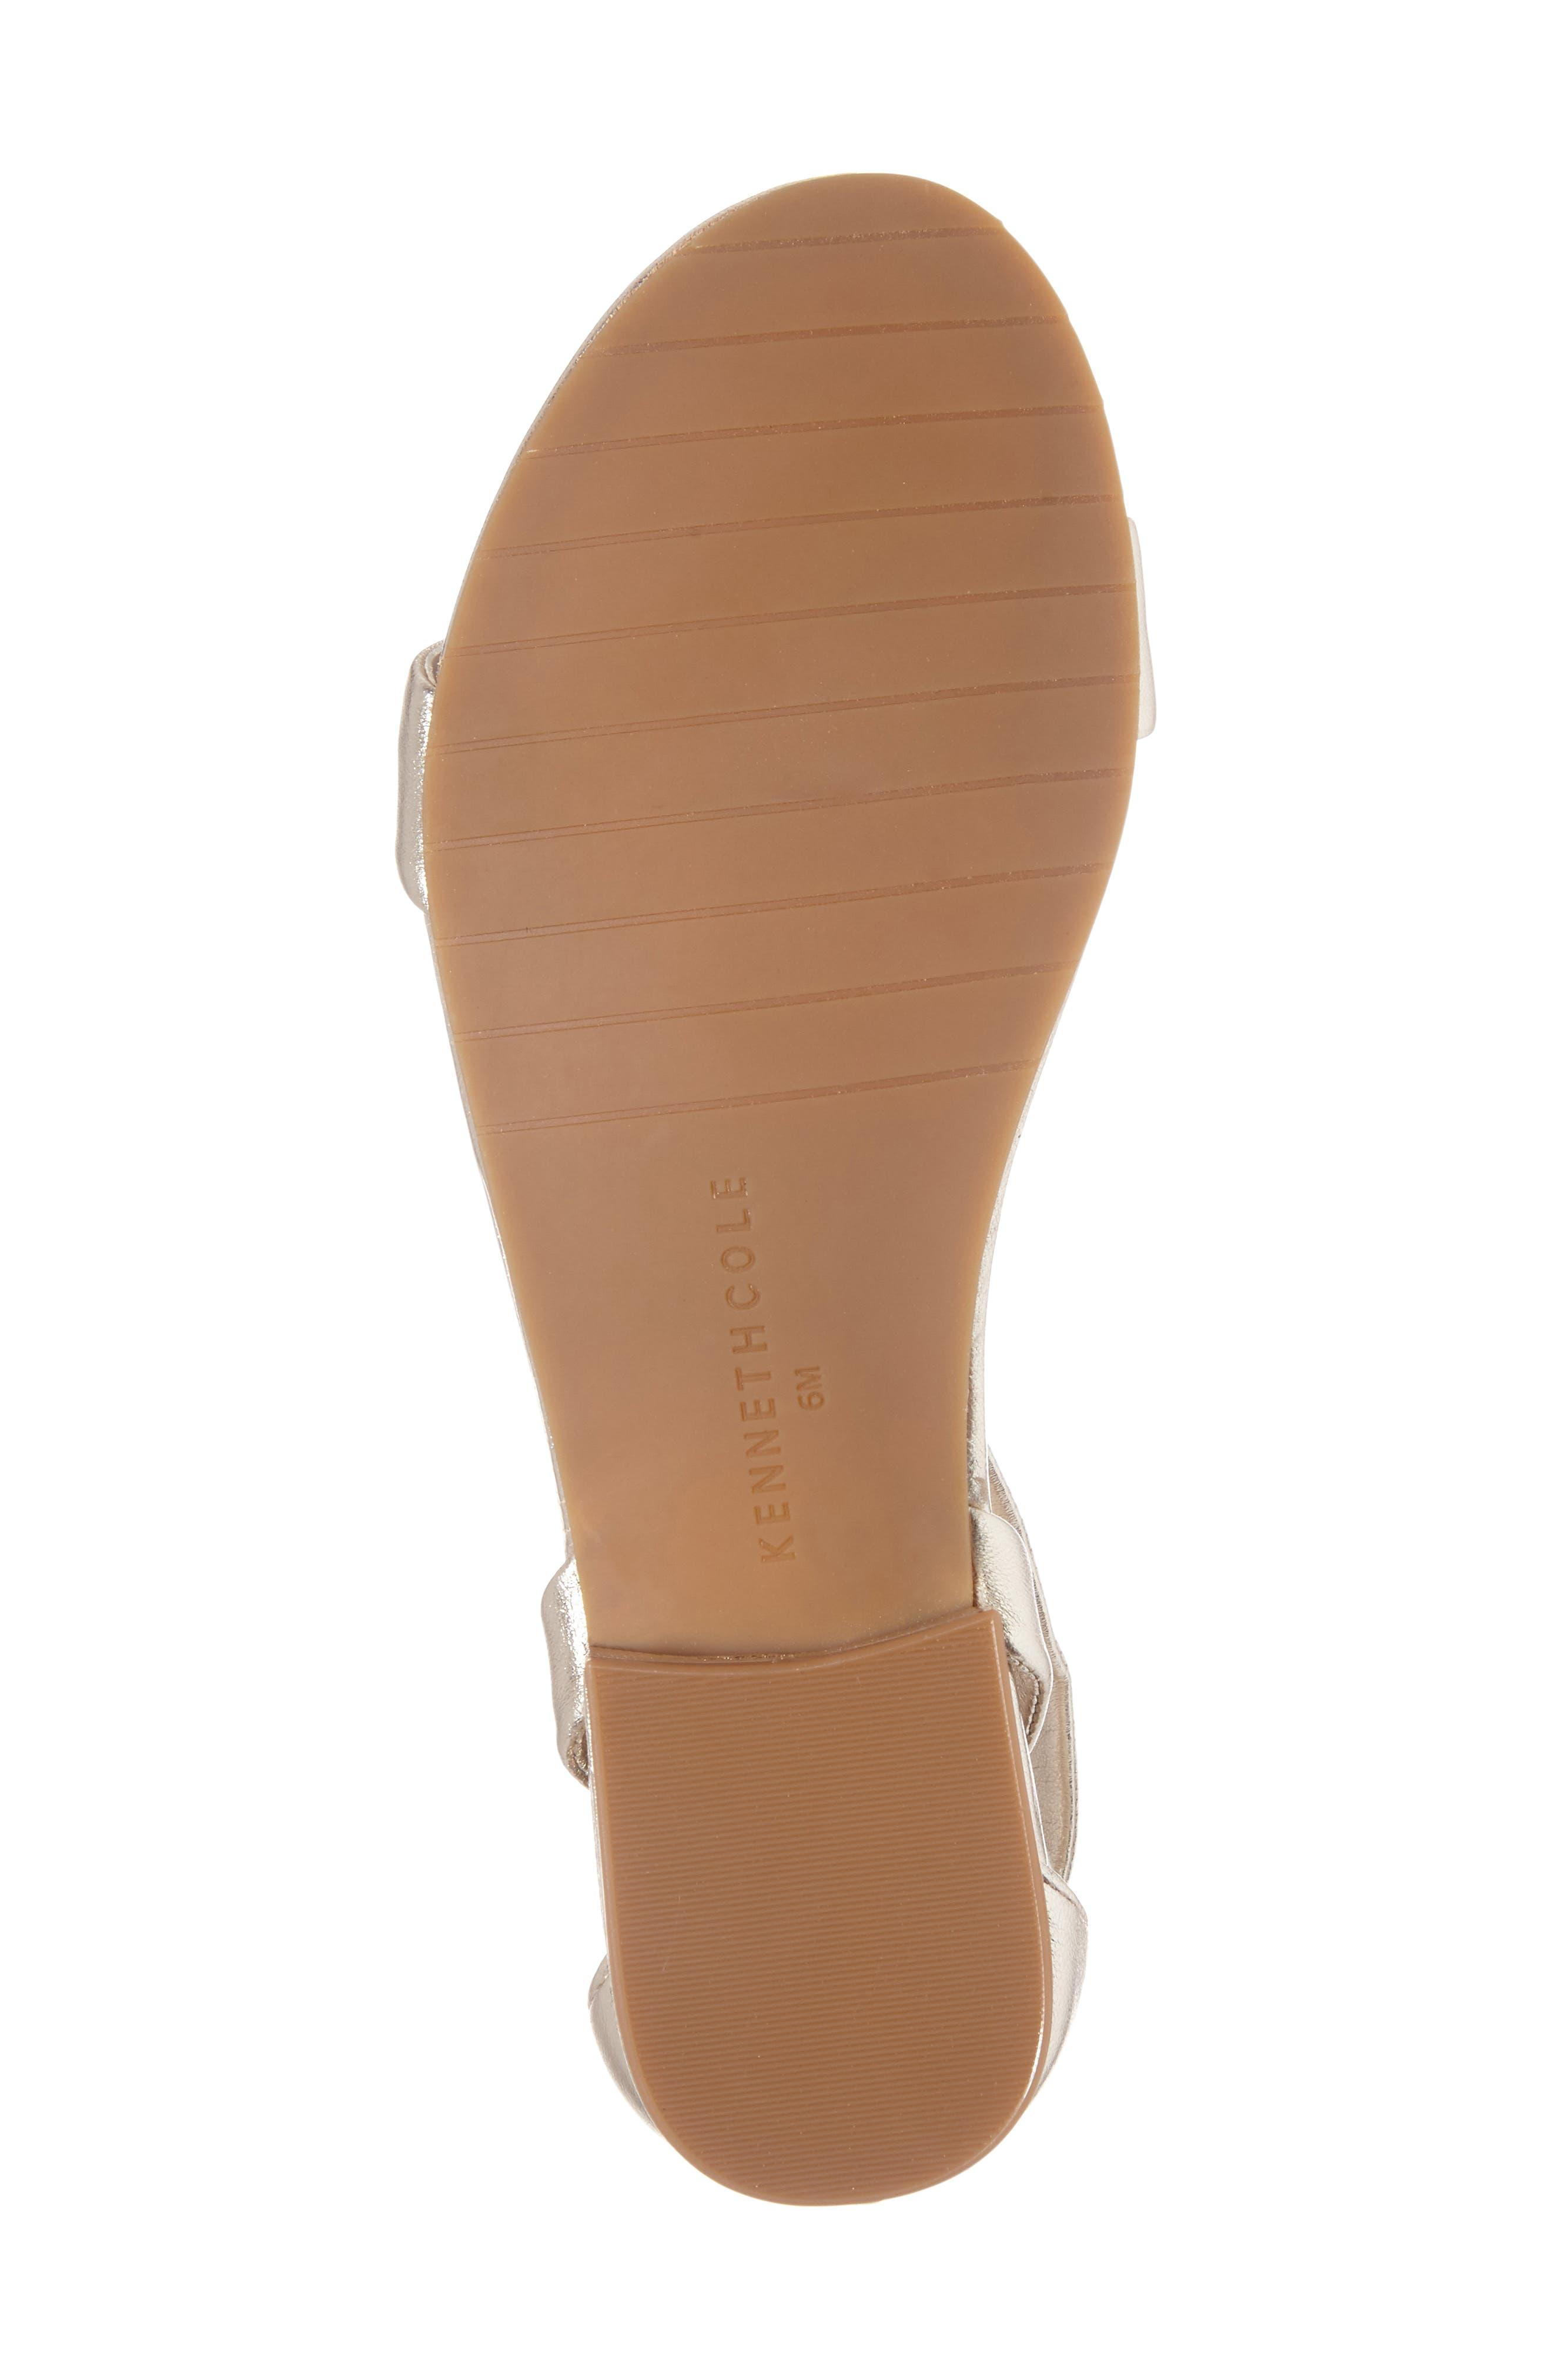 Valen Tassel Lace-Up Sandal,                             Alternate thumbnail 55, color,